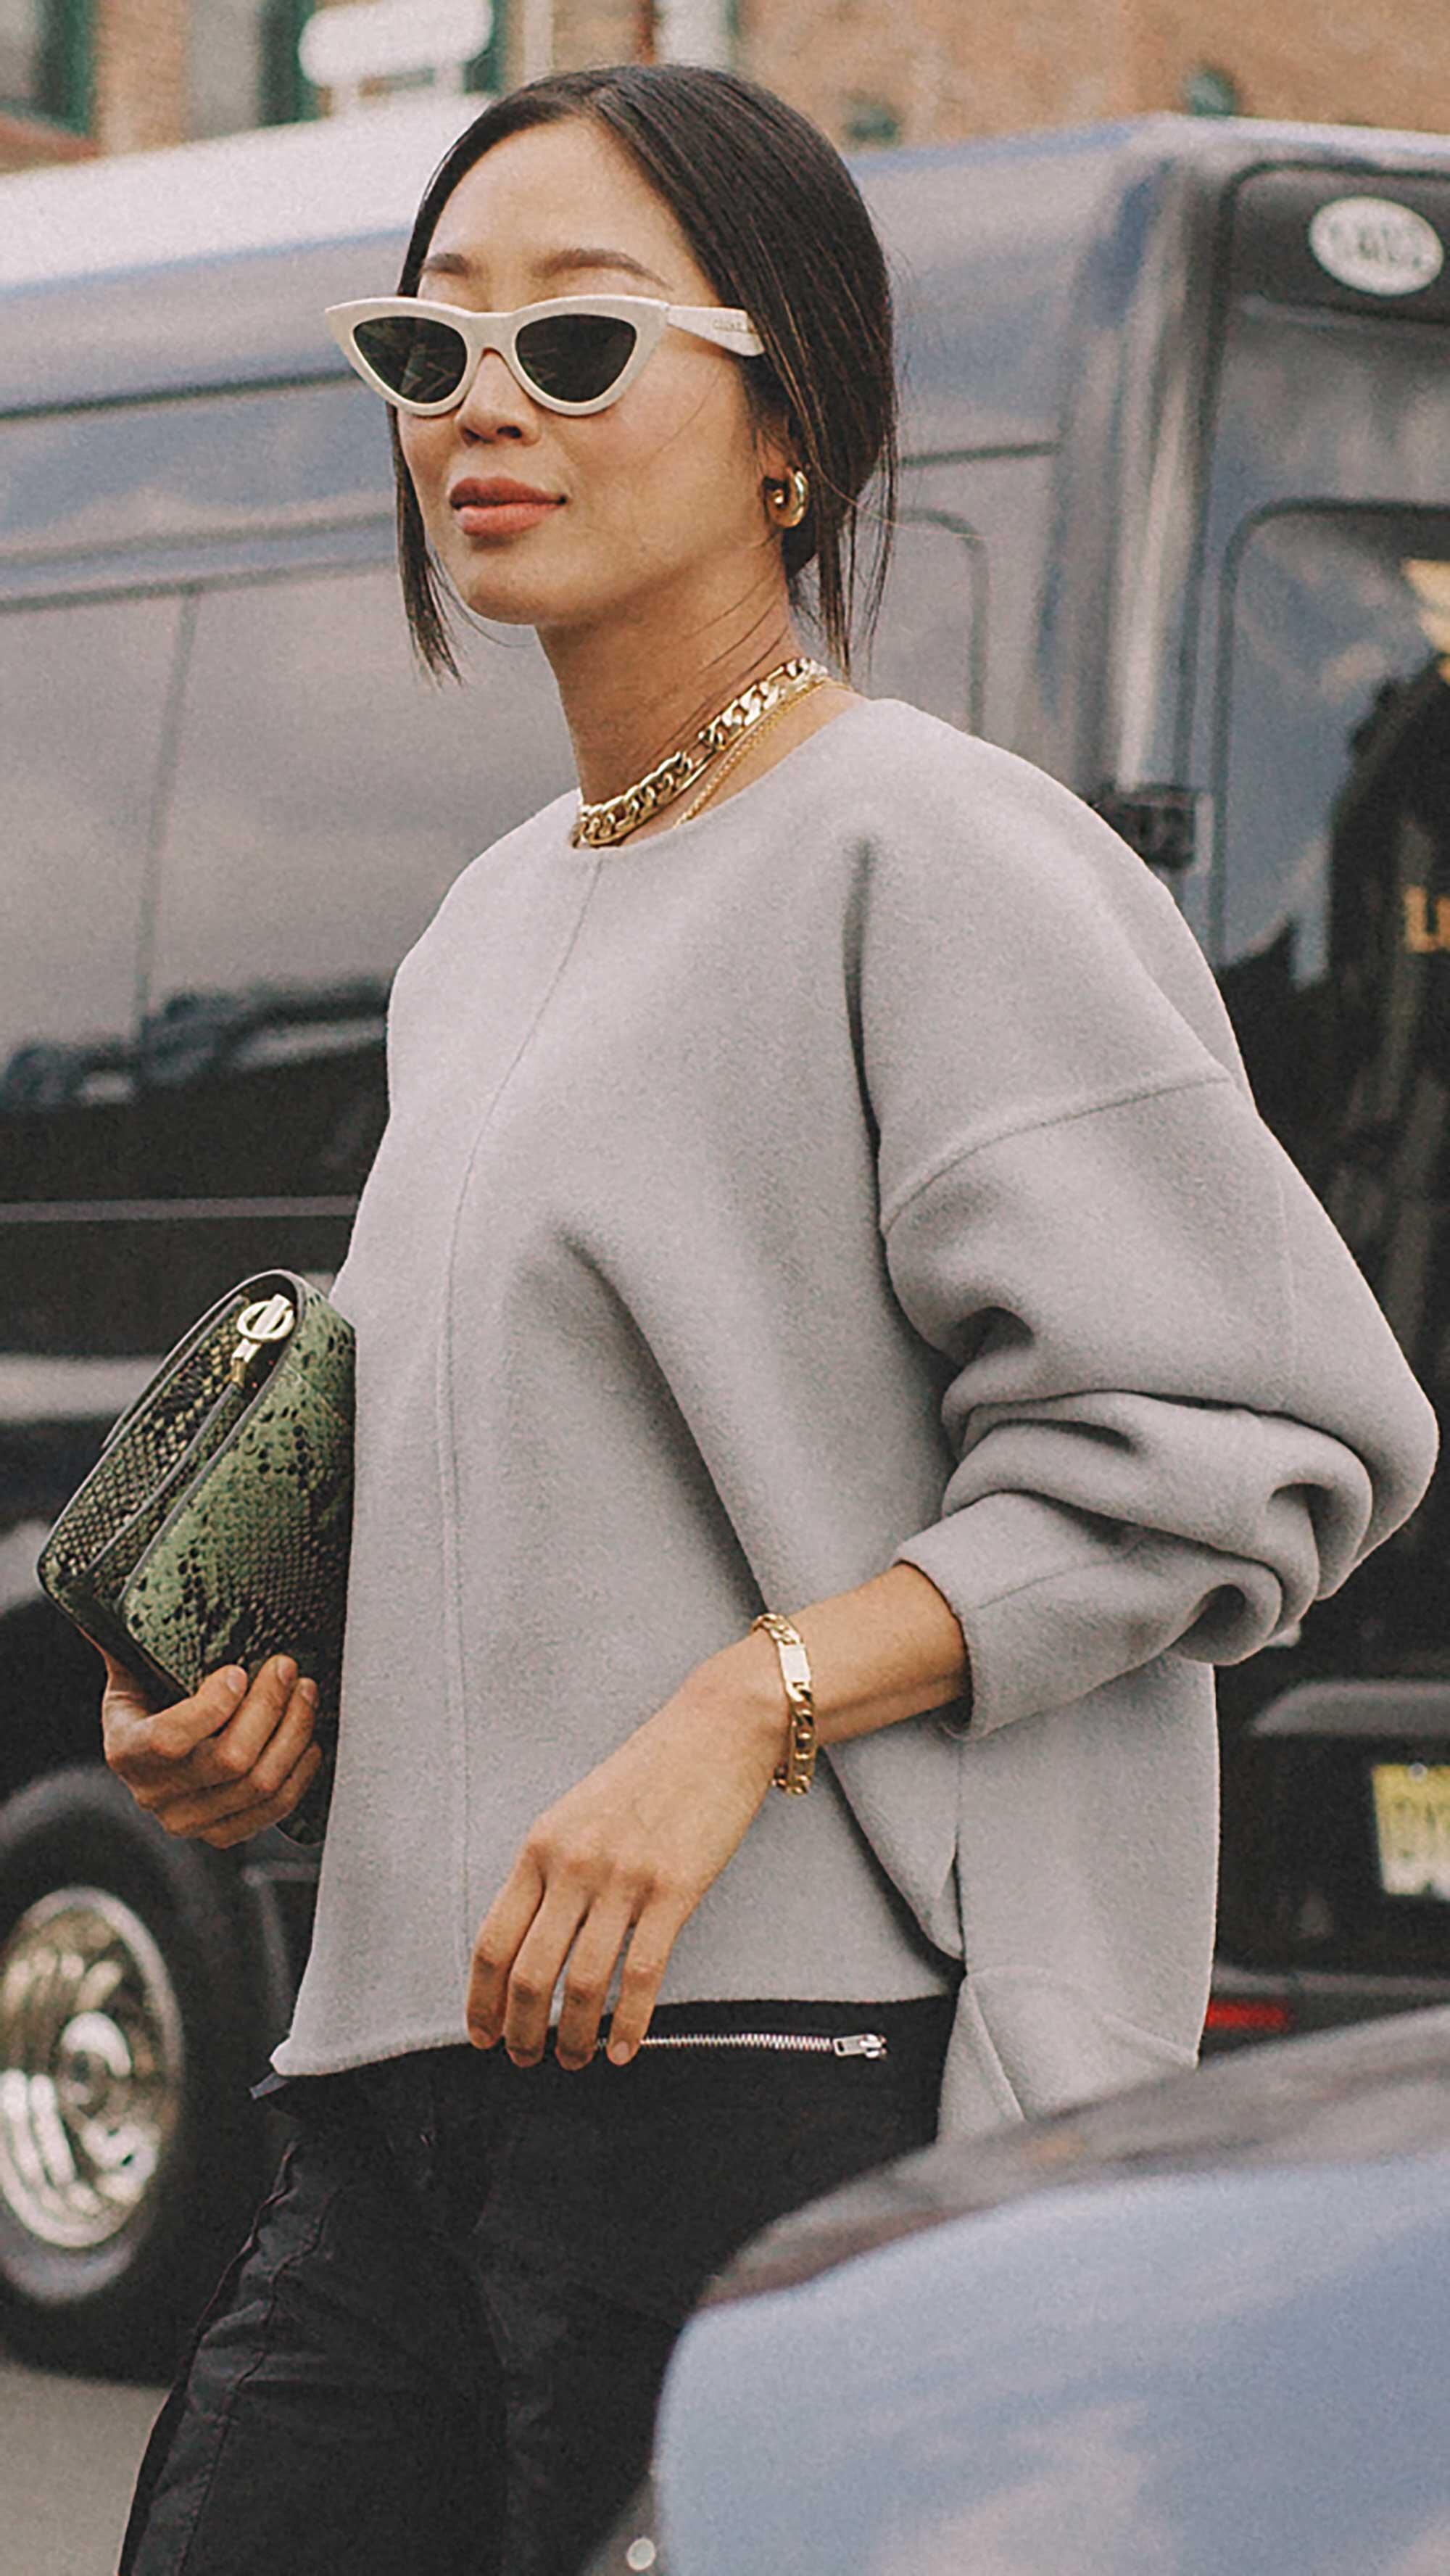 Click for more looks! Best outfits of New York Fashion Week street style 2019 Day Three Photo by @J2martinez Jose J. Martinez www.jmrtnz.com -74.jpg